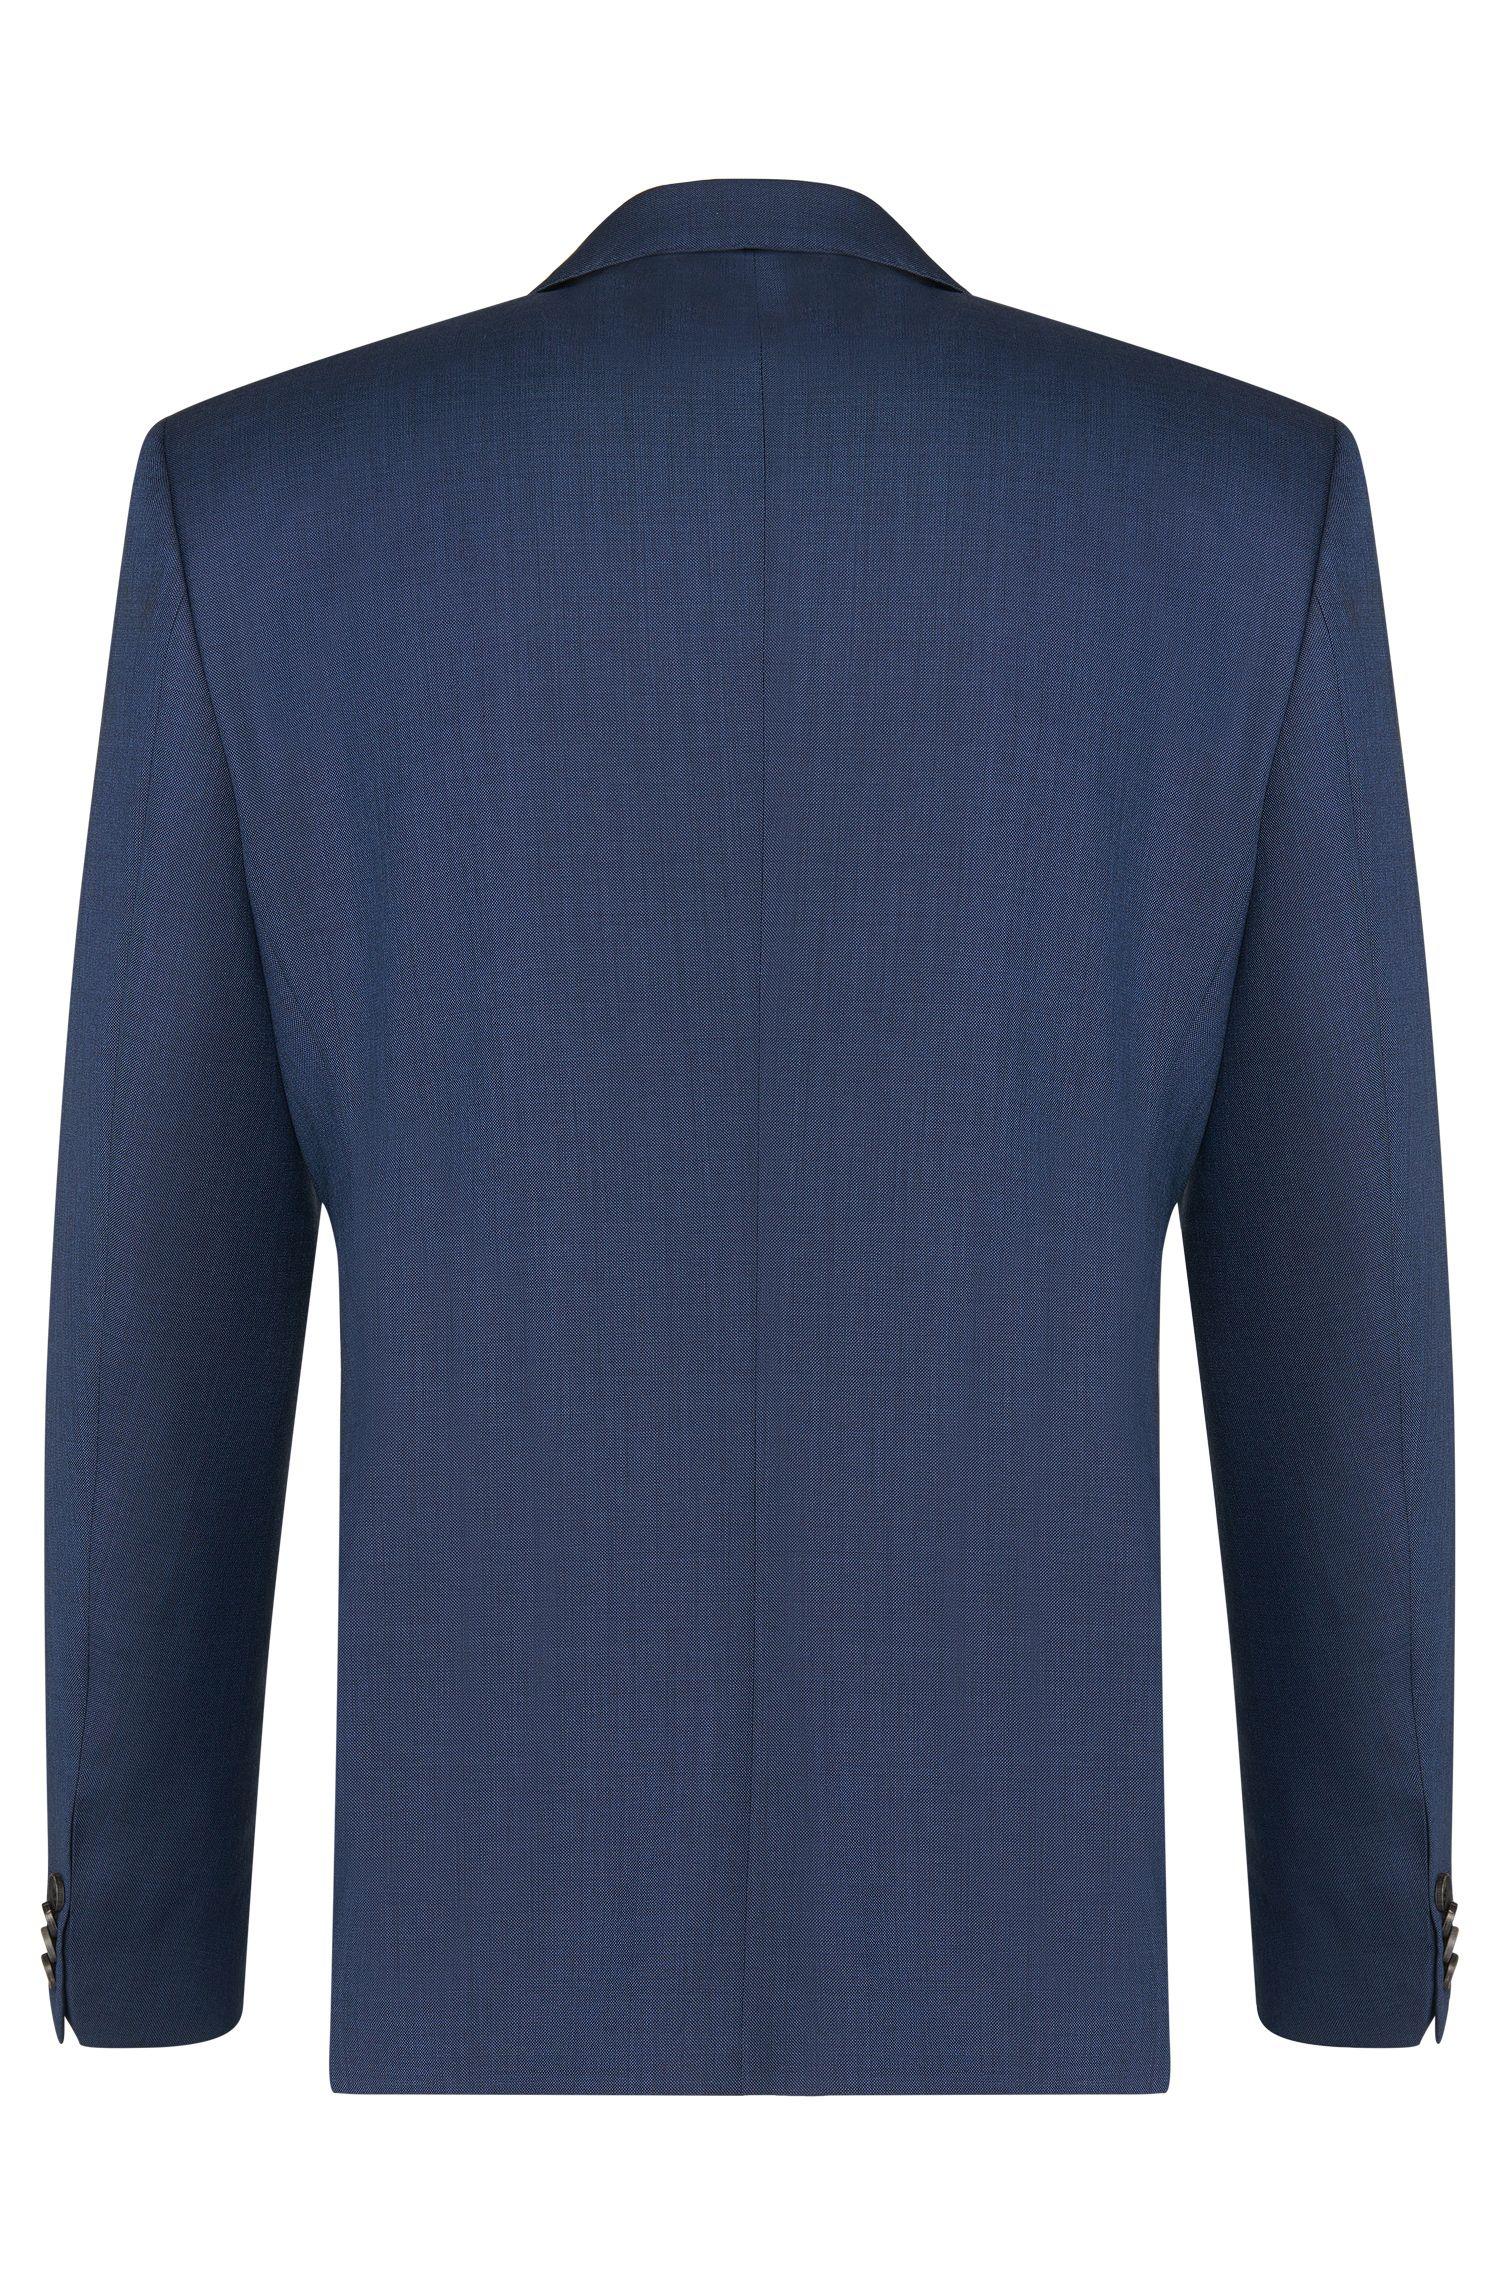 Unifarbener Slim-Fit Anzug aus reiner Schurwolle: 'C-Huge1/C-Genuis'